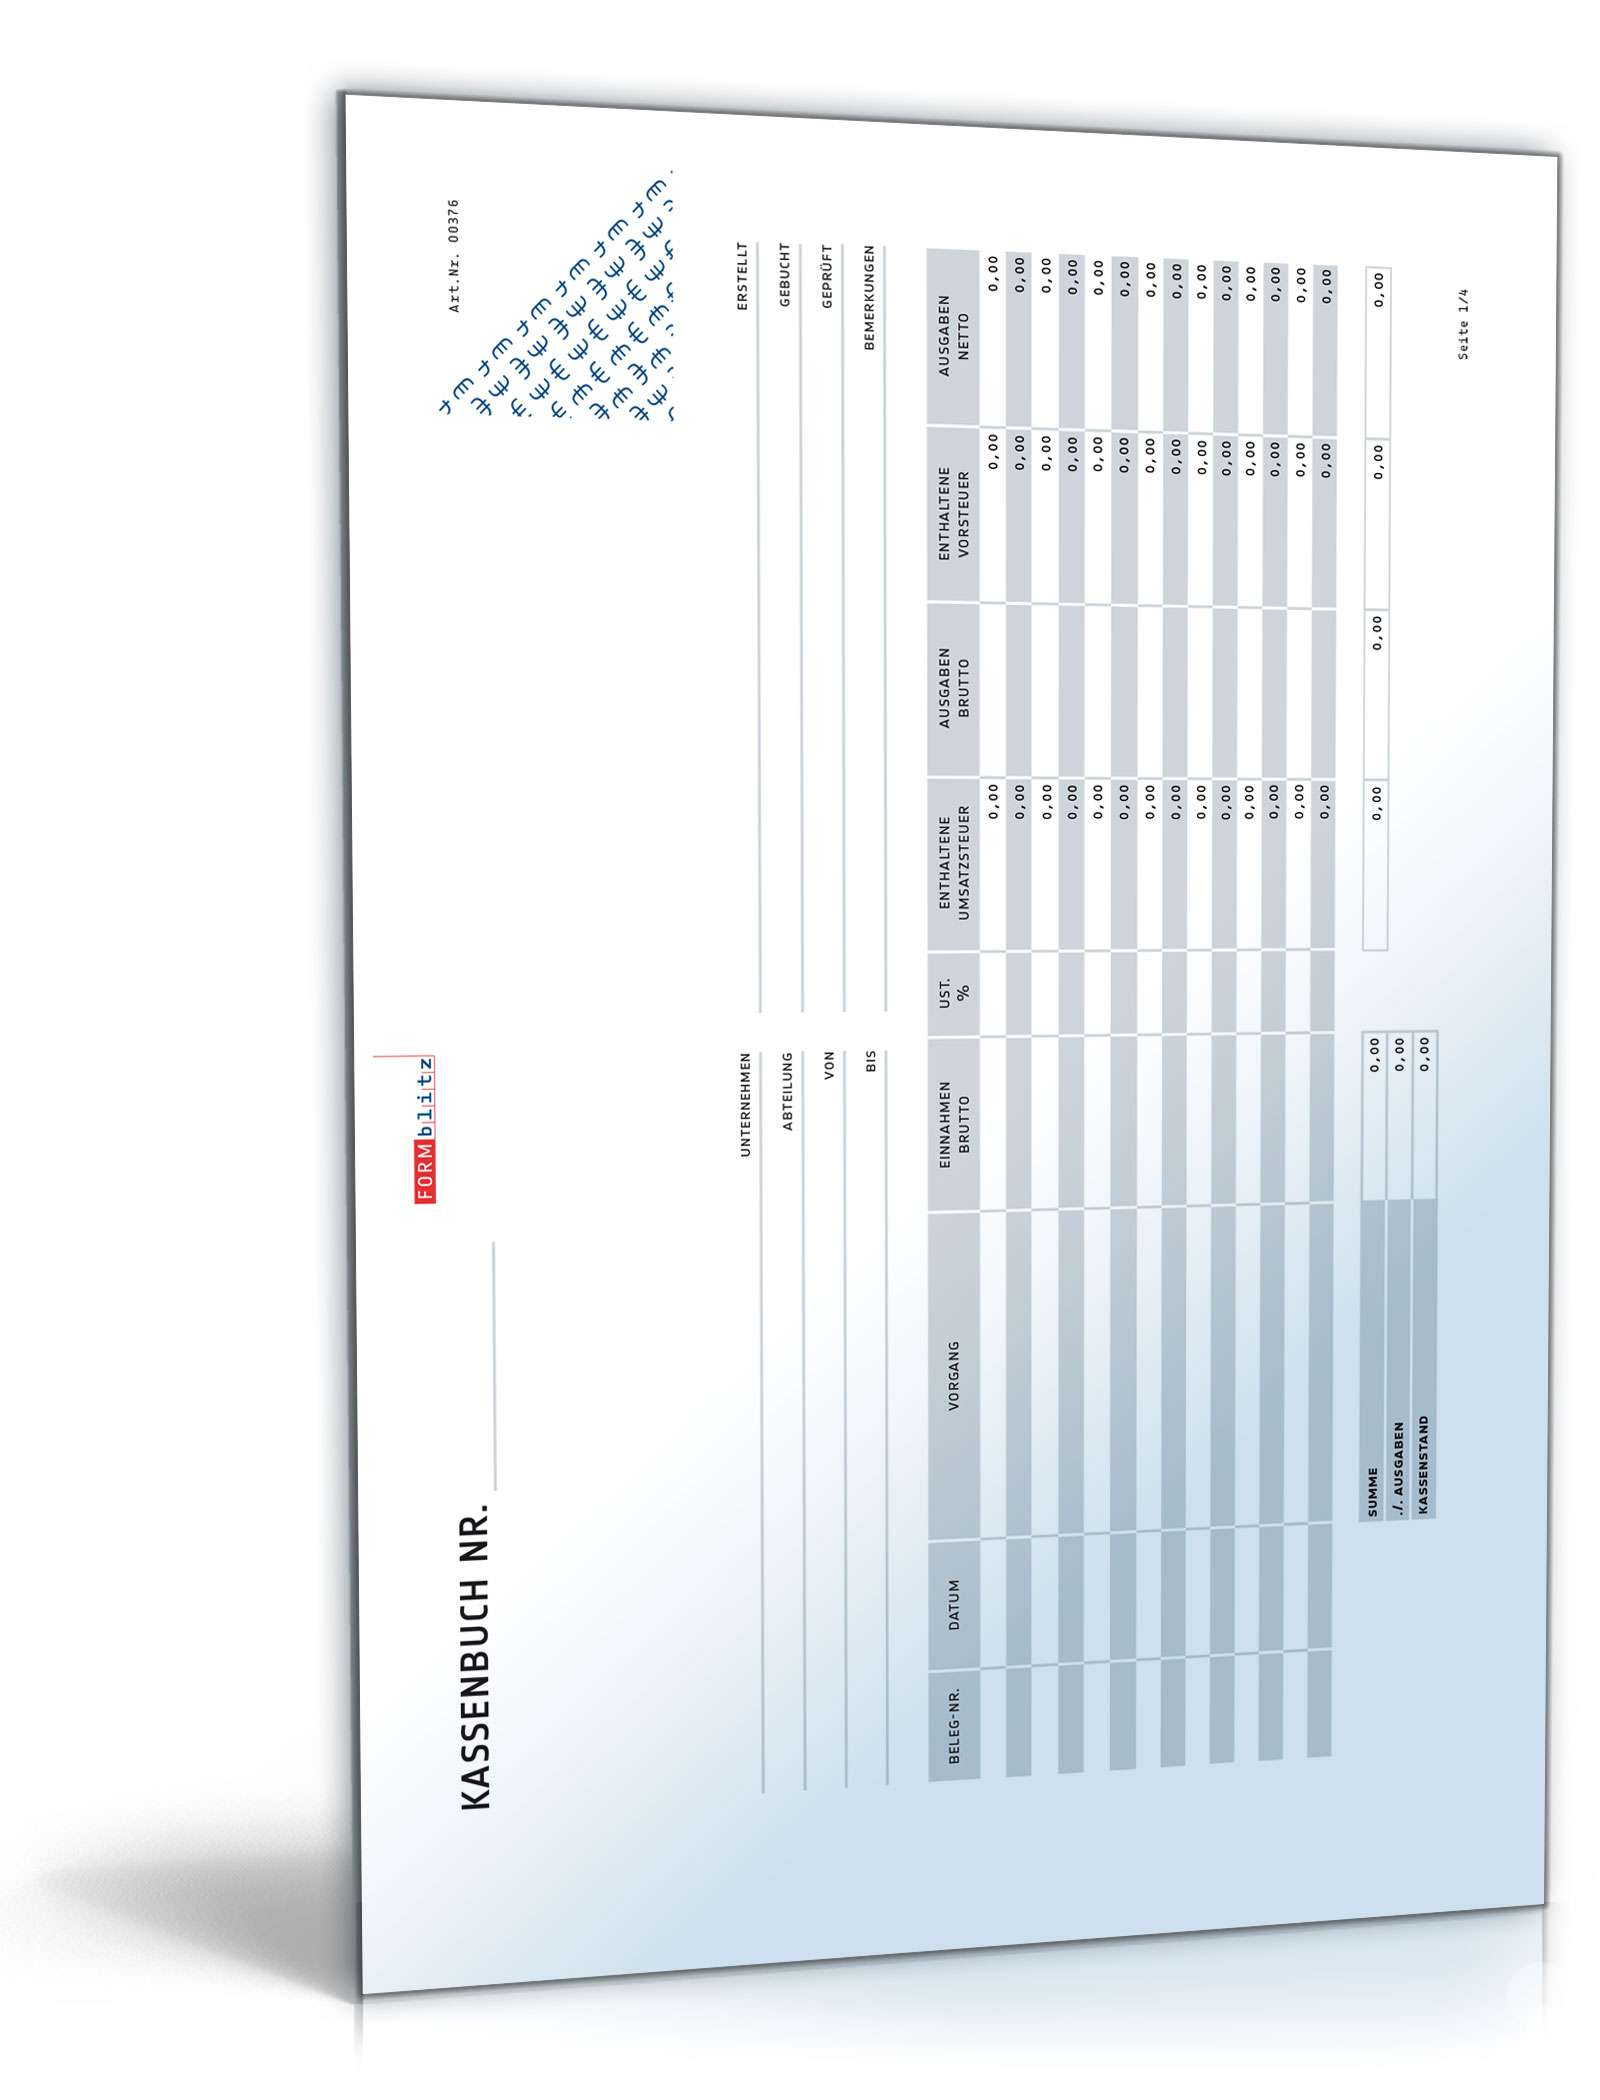 kassenbuch formular zum download. Black Bedroom Furniture Sets. Home Design Ideas